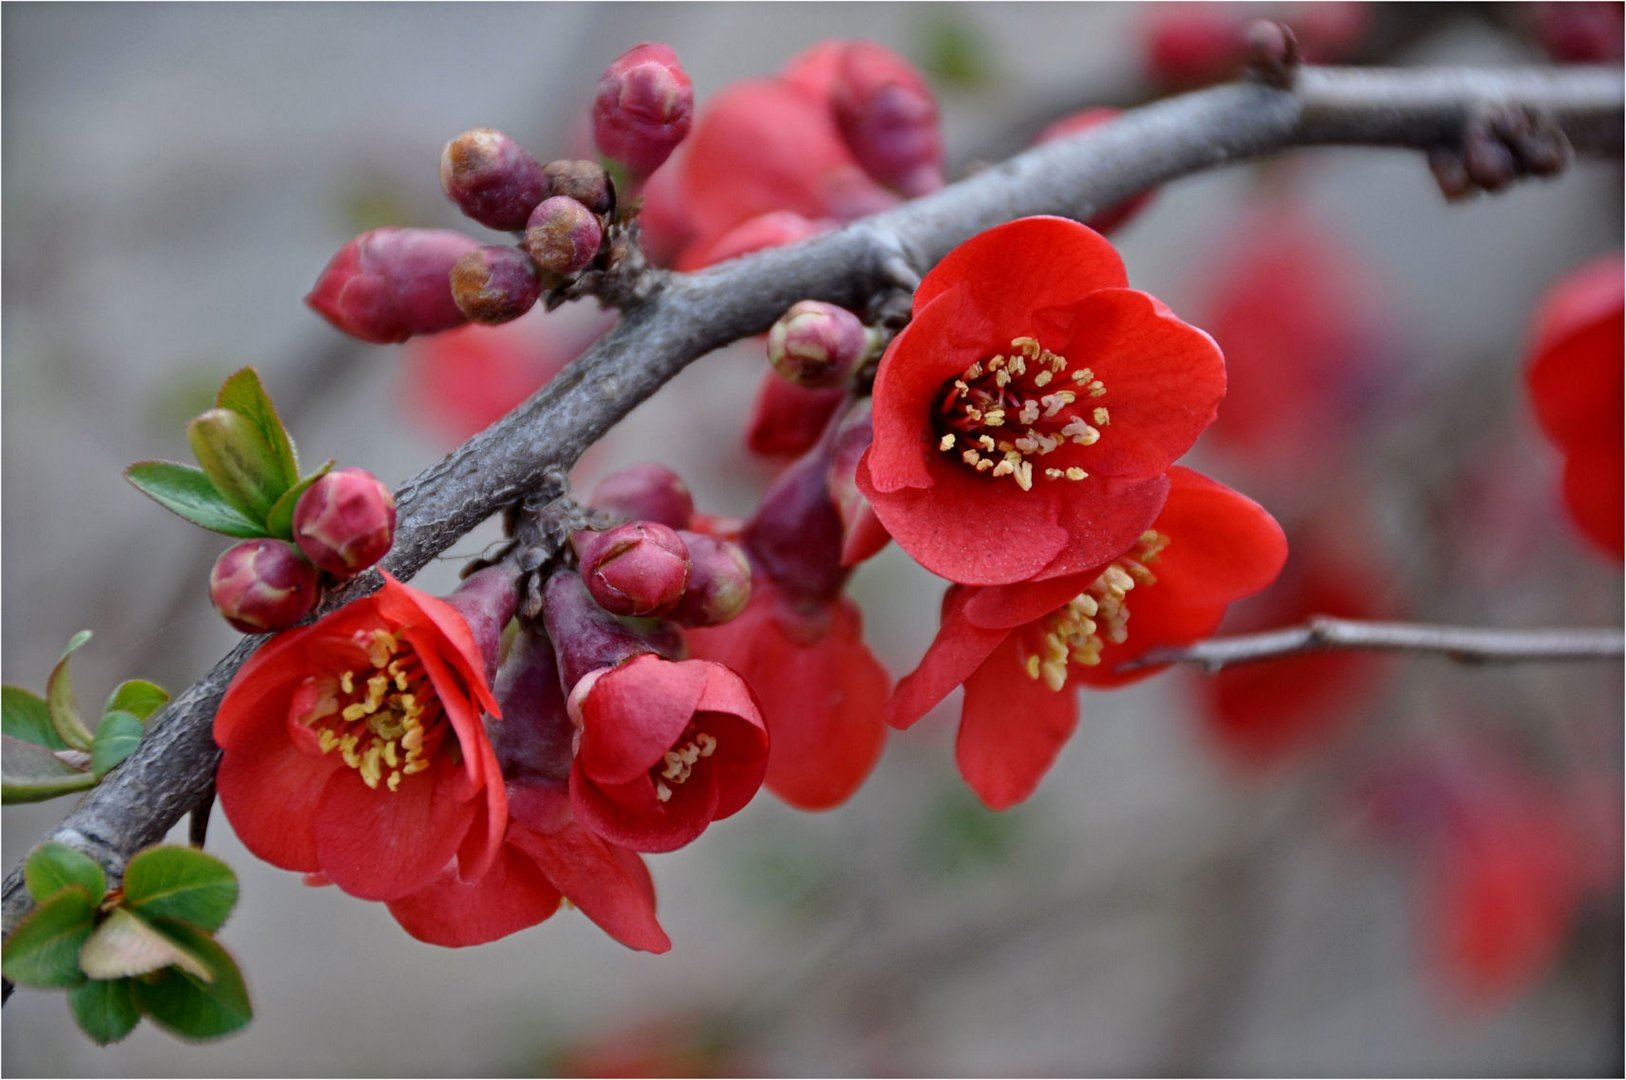 Japanische zierquitte foto bild pflanzen pilze flechten bl ten kleinpflanzen - Japanische gartenpflanzen ...